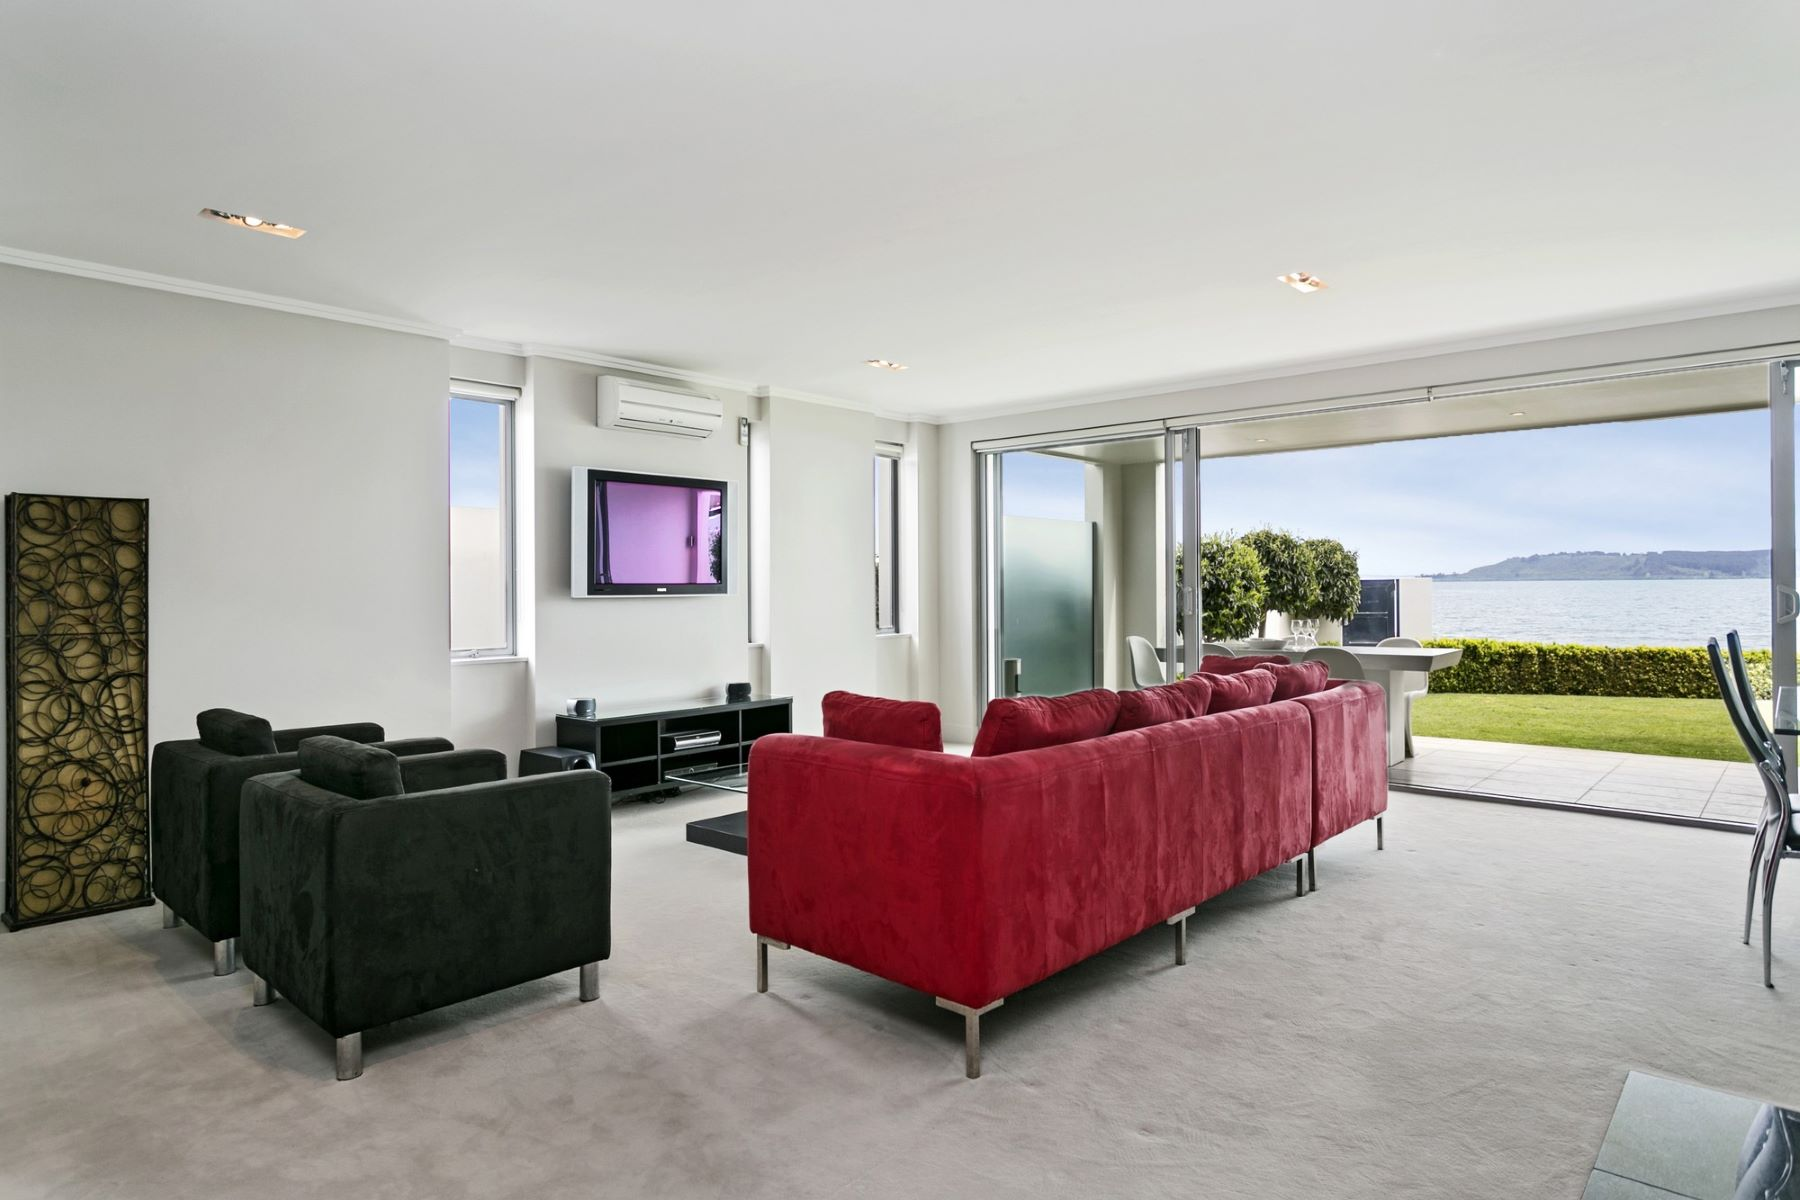 Apartments for Sale at 3/225 Lake Terrace, Waipahihi, Taupo Taupo, Waikato New Zealand